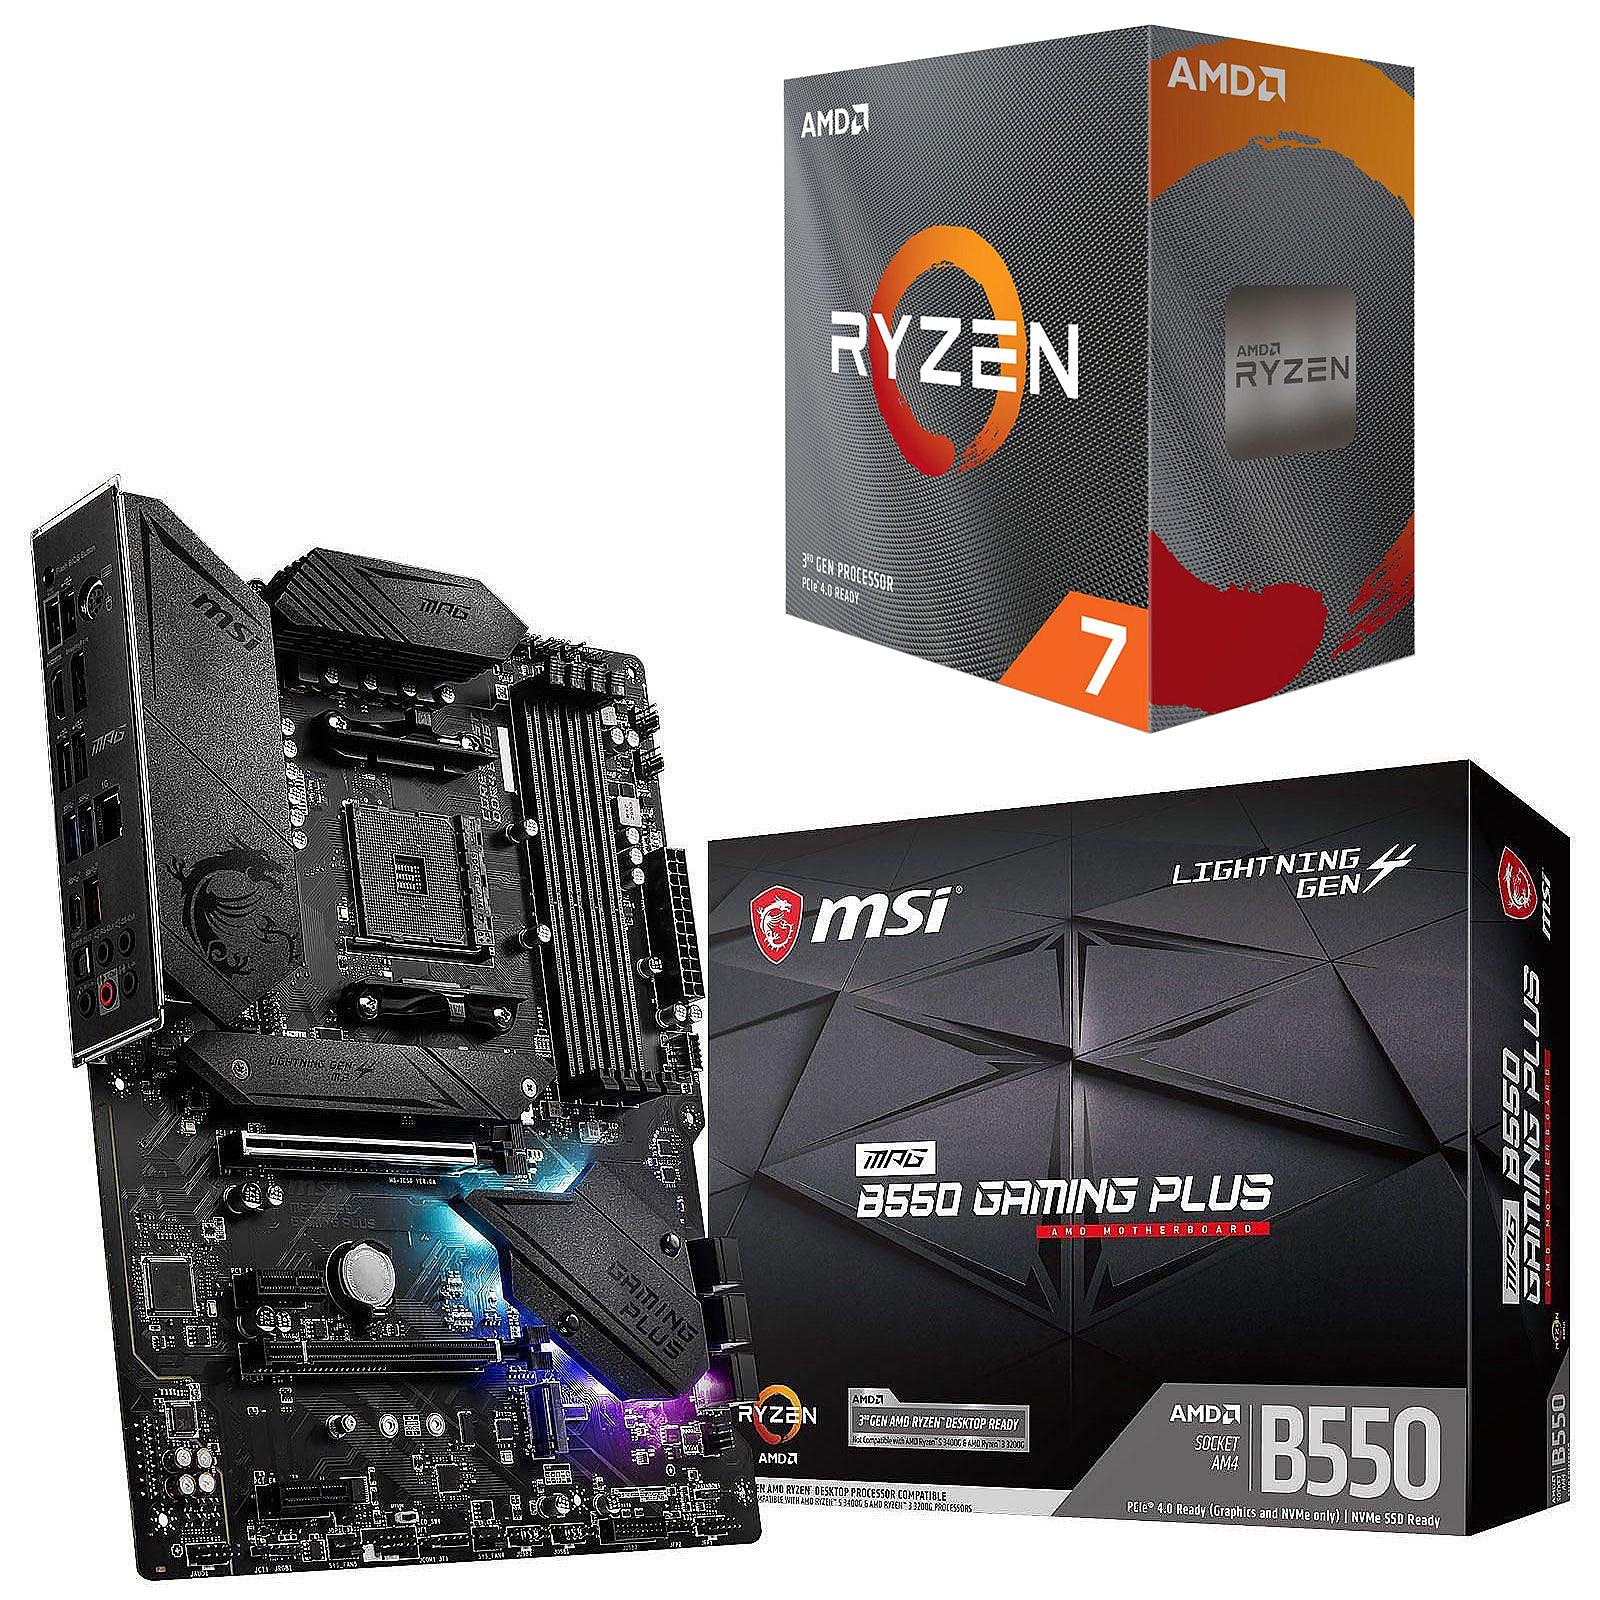 Kit Upgrade PC AMD Ryzen 7 3800XT MSI MPG B550 GAMING PLUS